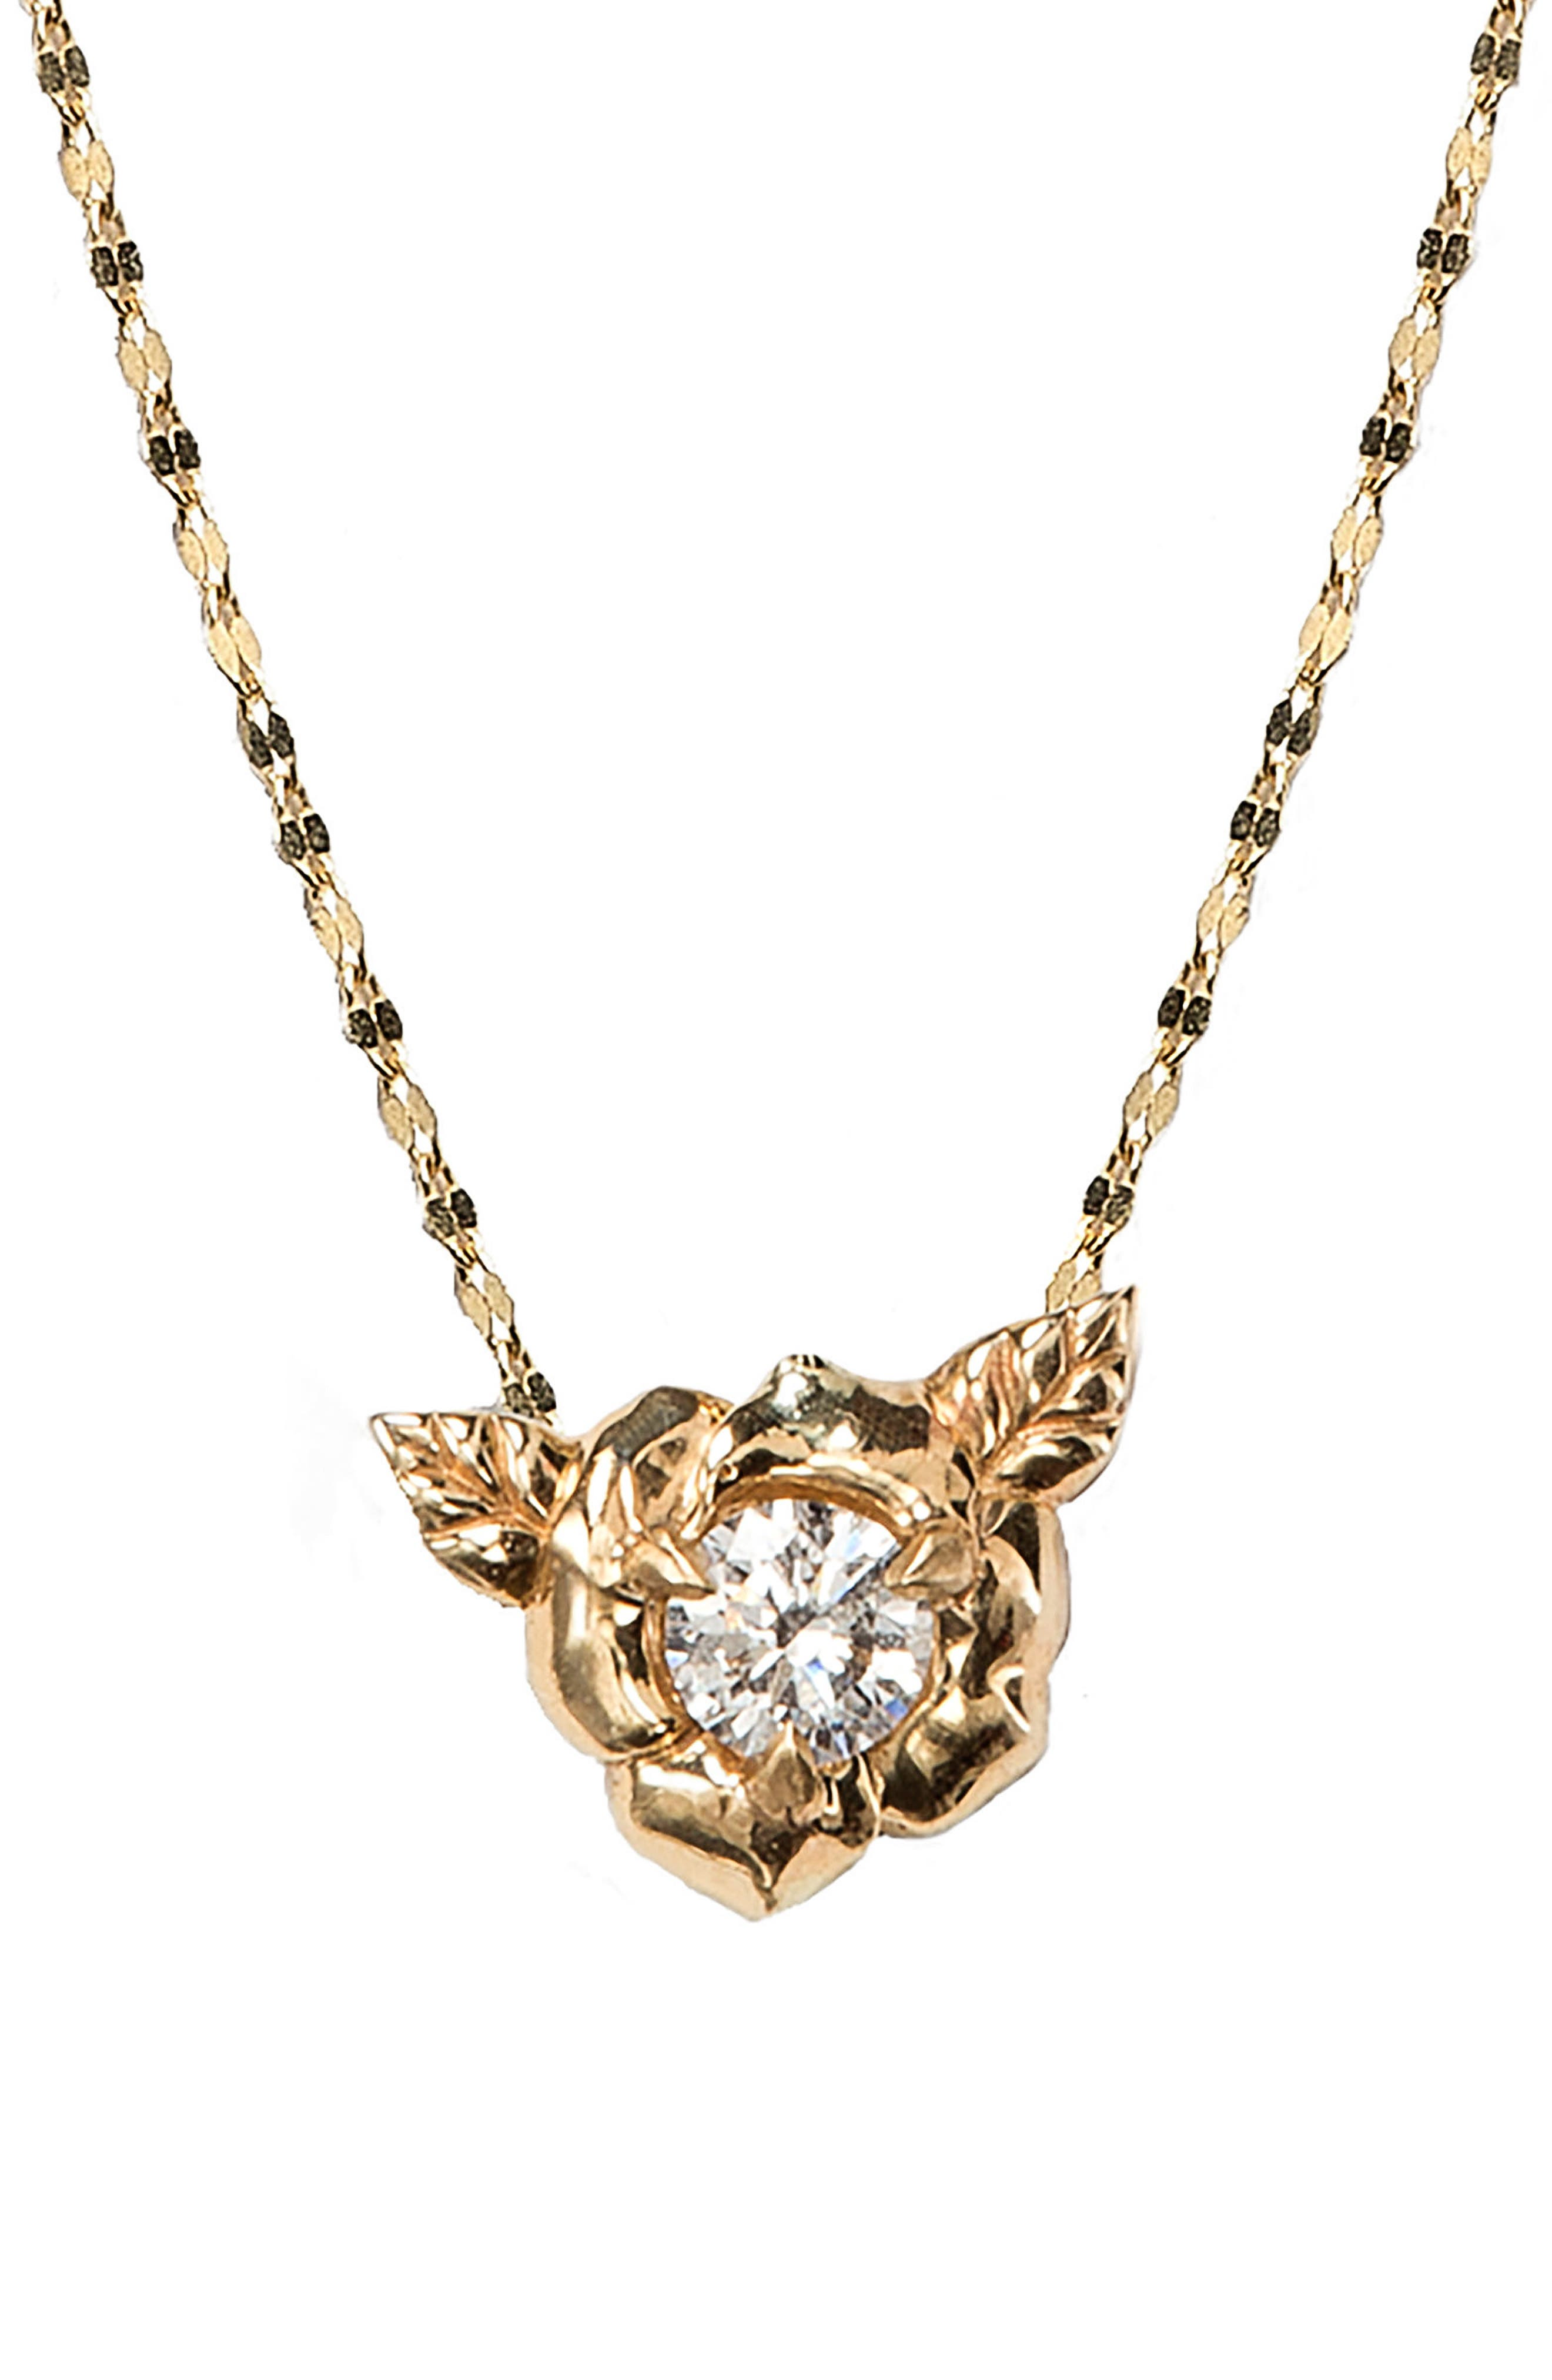 Little Rosebud Pendant Necklace,                             Main thumbnail 1, color,                             YELLOW GOLD